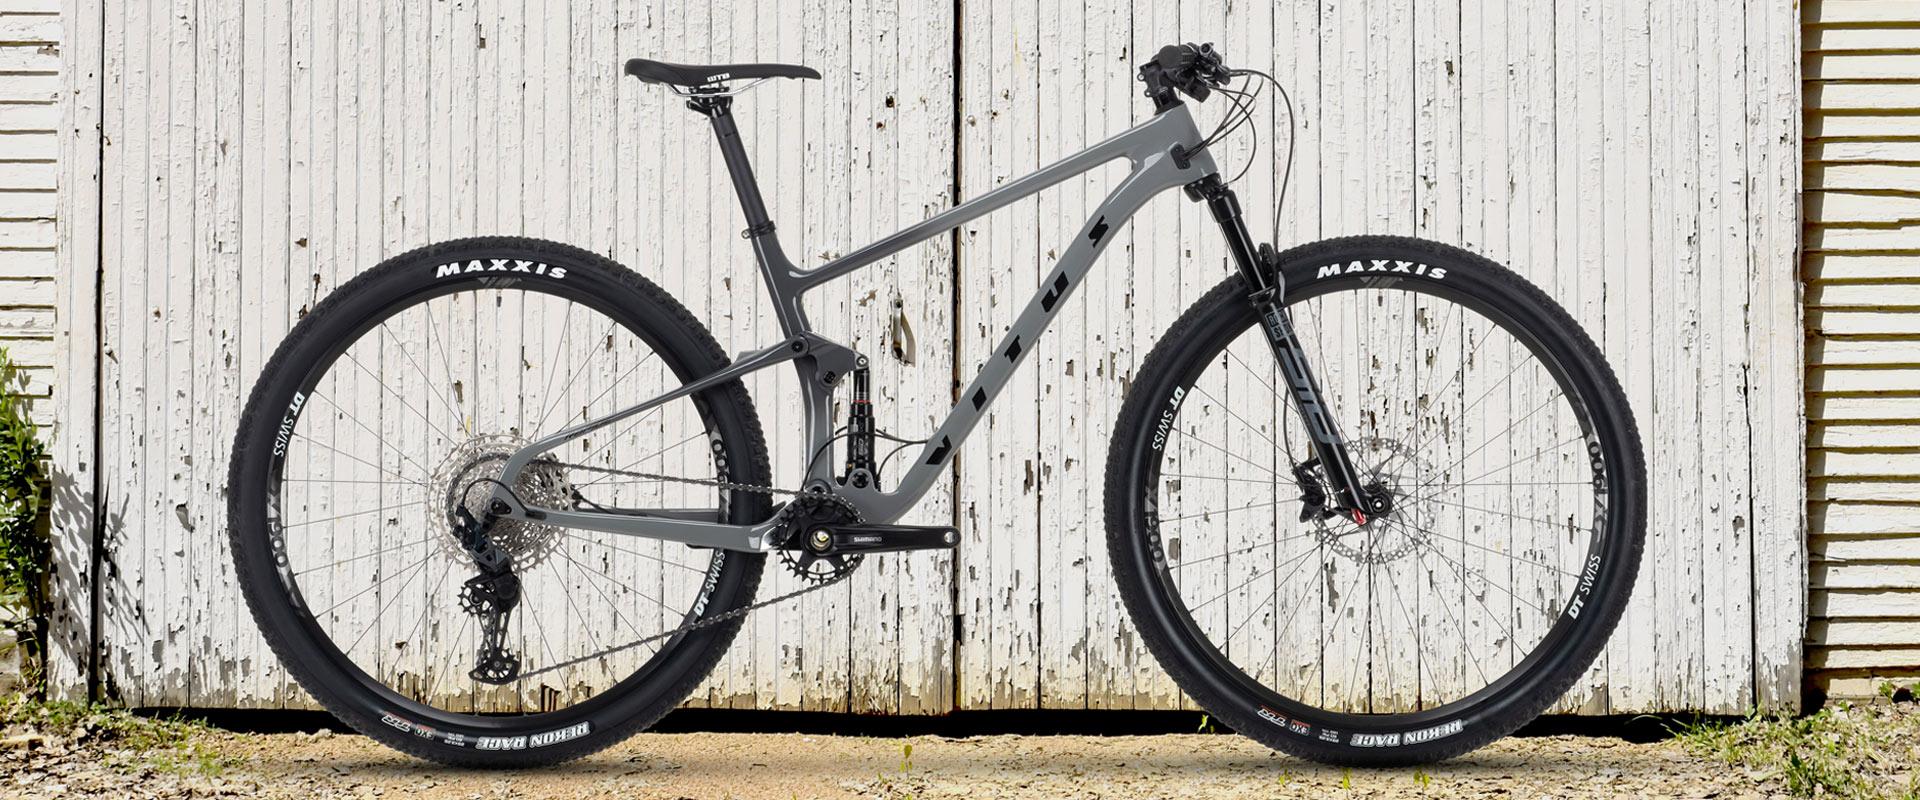 Vitus Rapide FS CR Mountain Bike